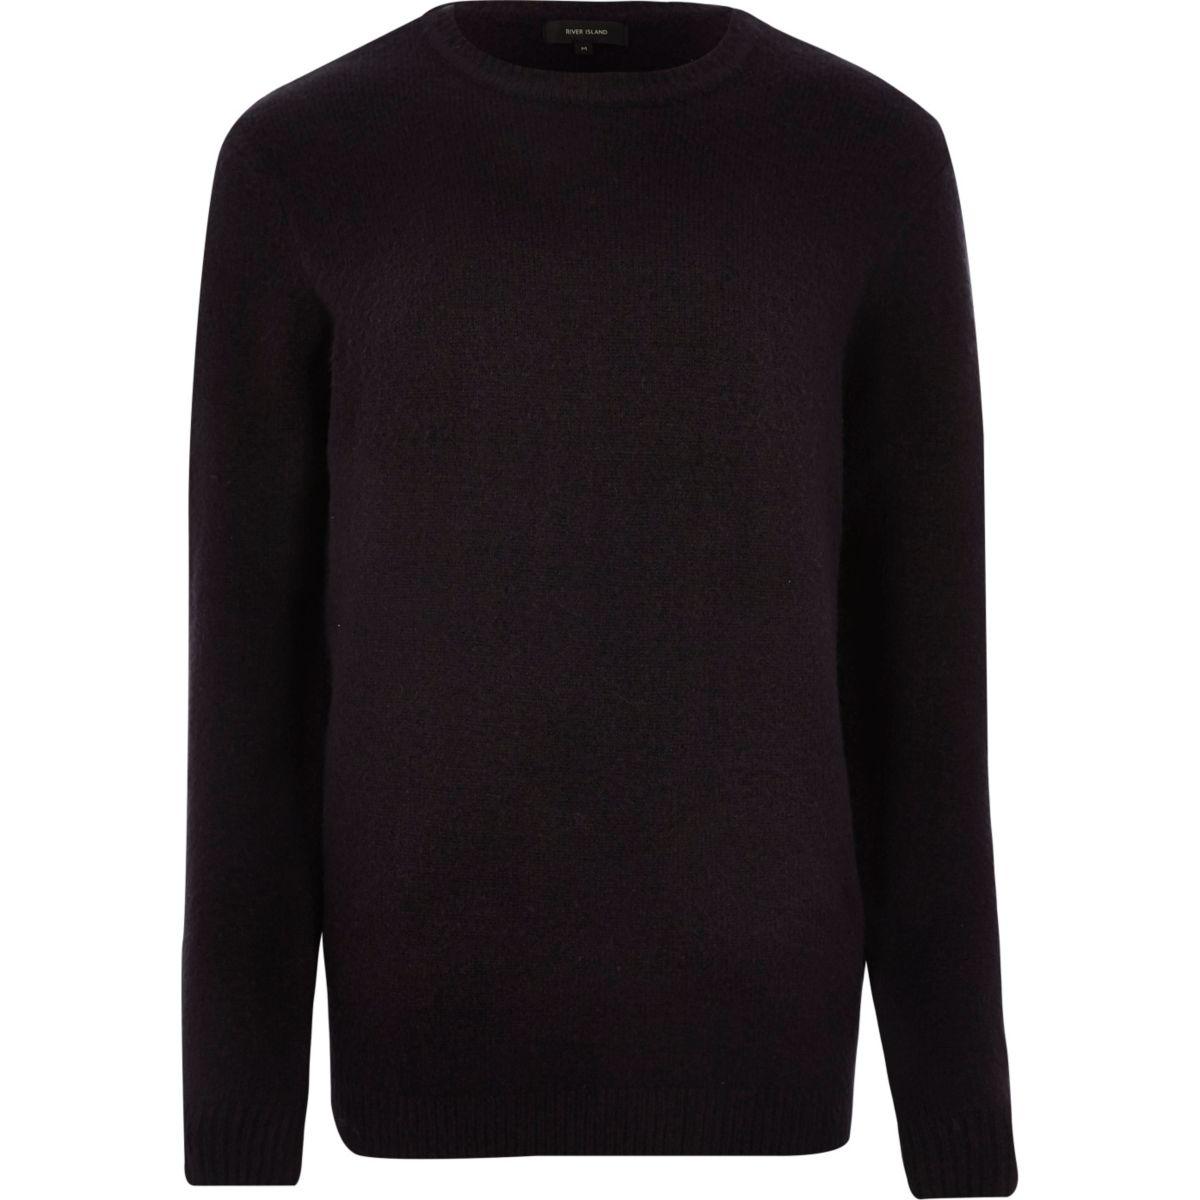 Navy soft crew neck knit sweater